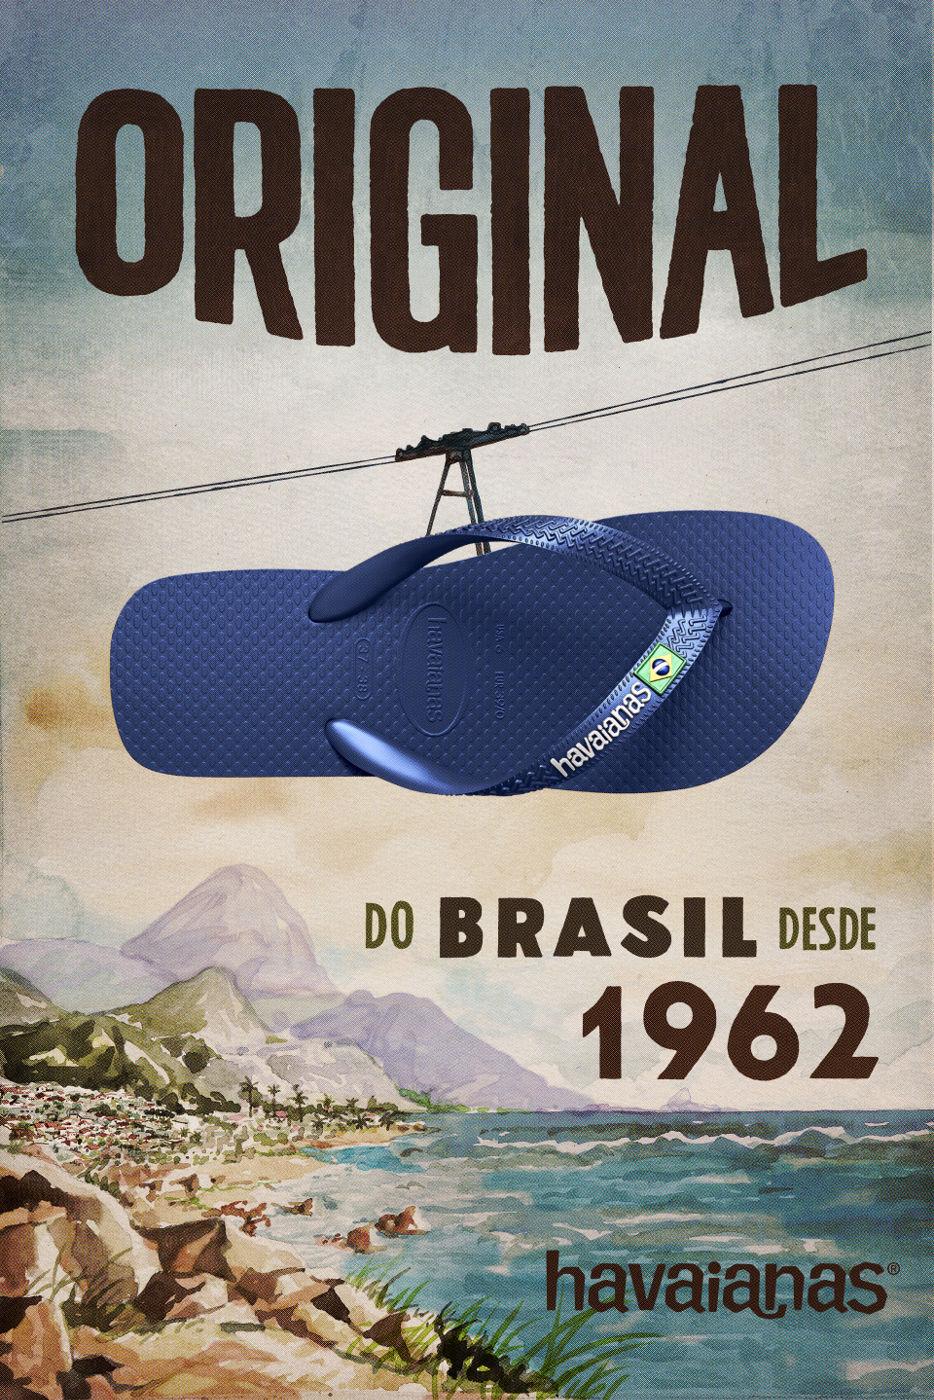 Havaianas Brand History